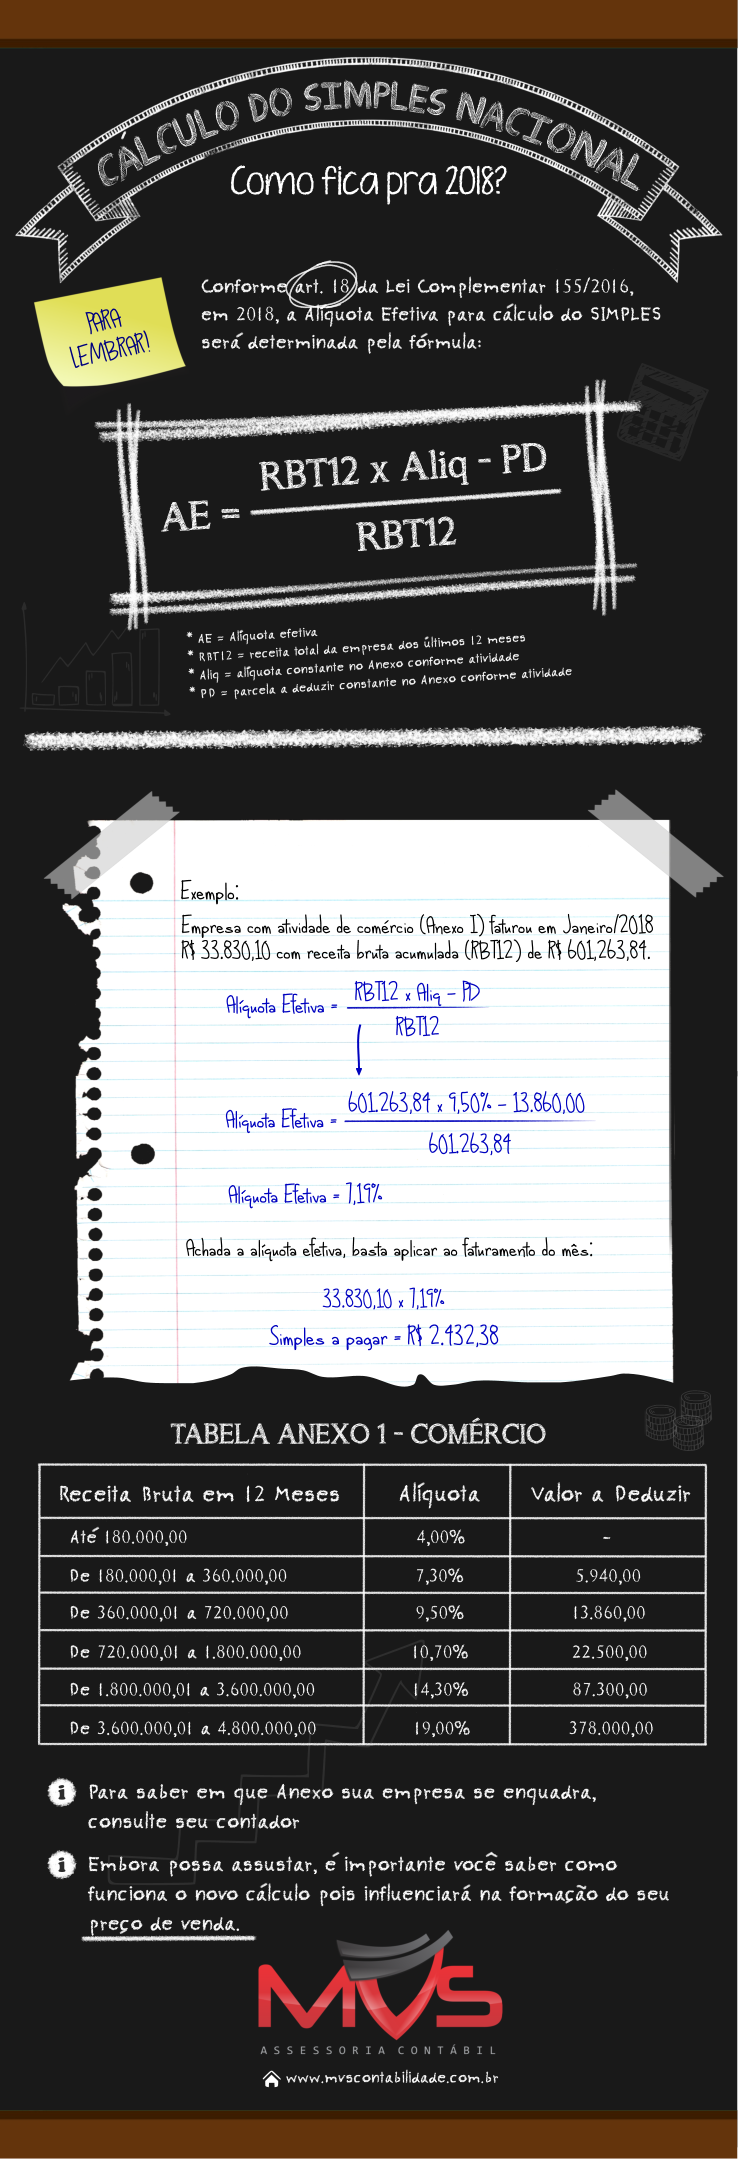 Infográfico Cálculo Simples Nacional